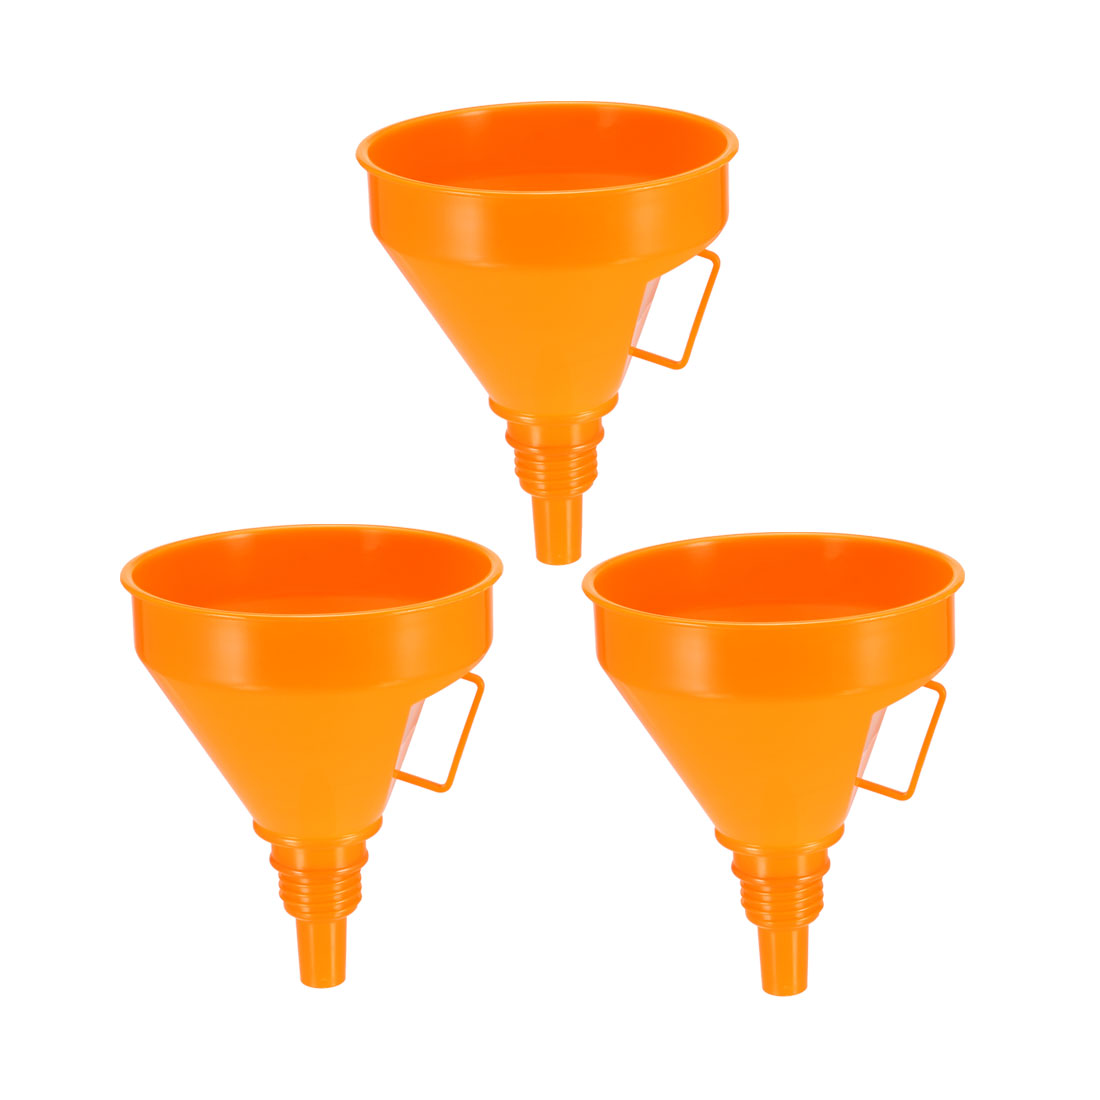 "Filter Funnel 5.3"" Plastic Feul Funnel Orange for Engine Oil Water Fuel 3pcs"